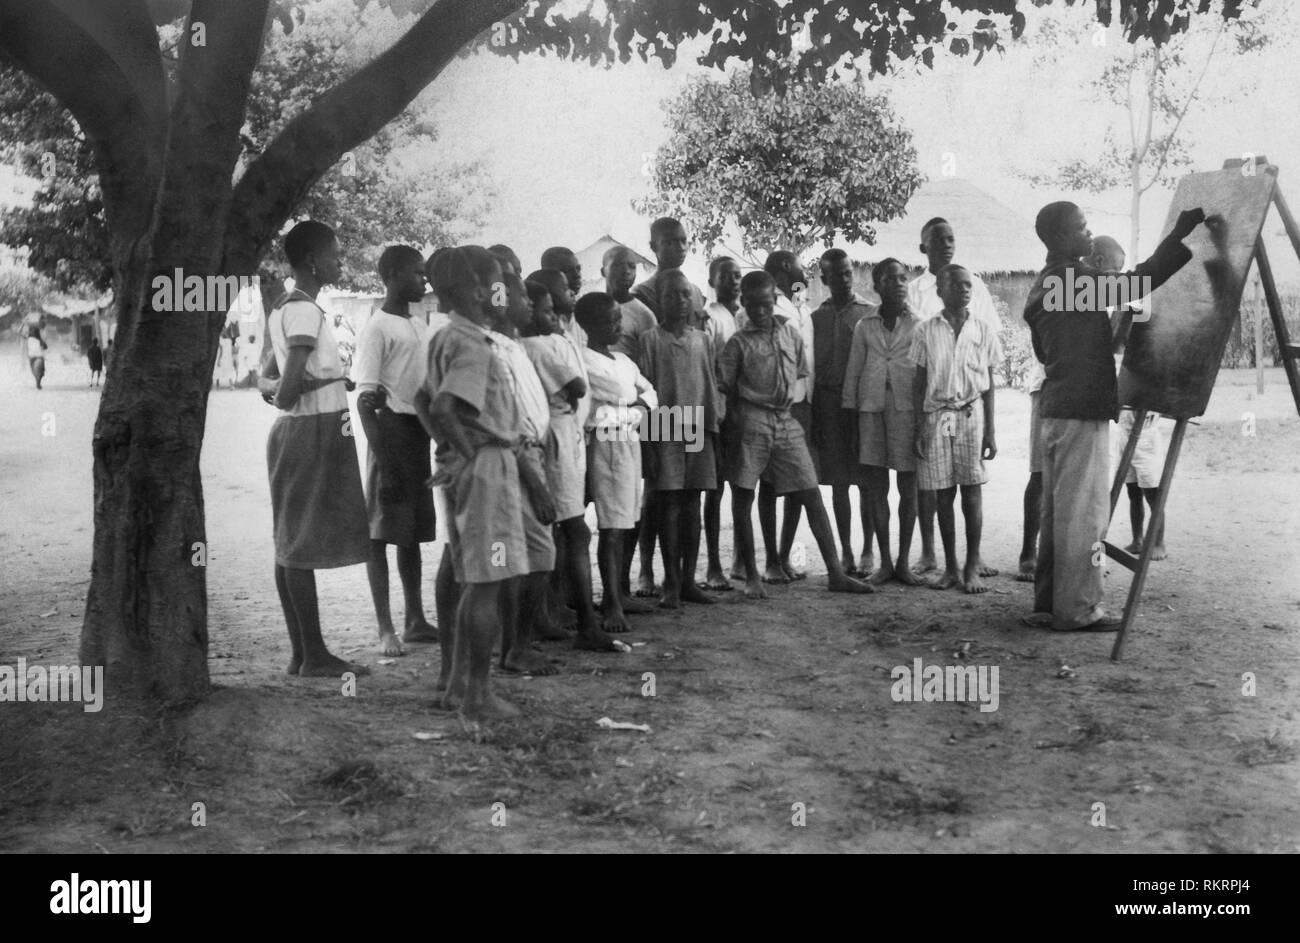 missionary school, zaria, nigeria, africa 1920 - Stock Image